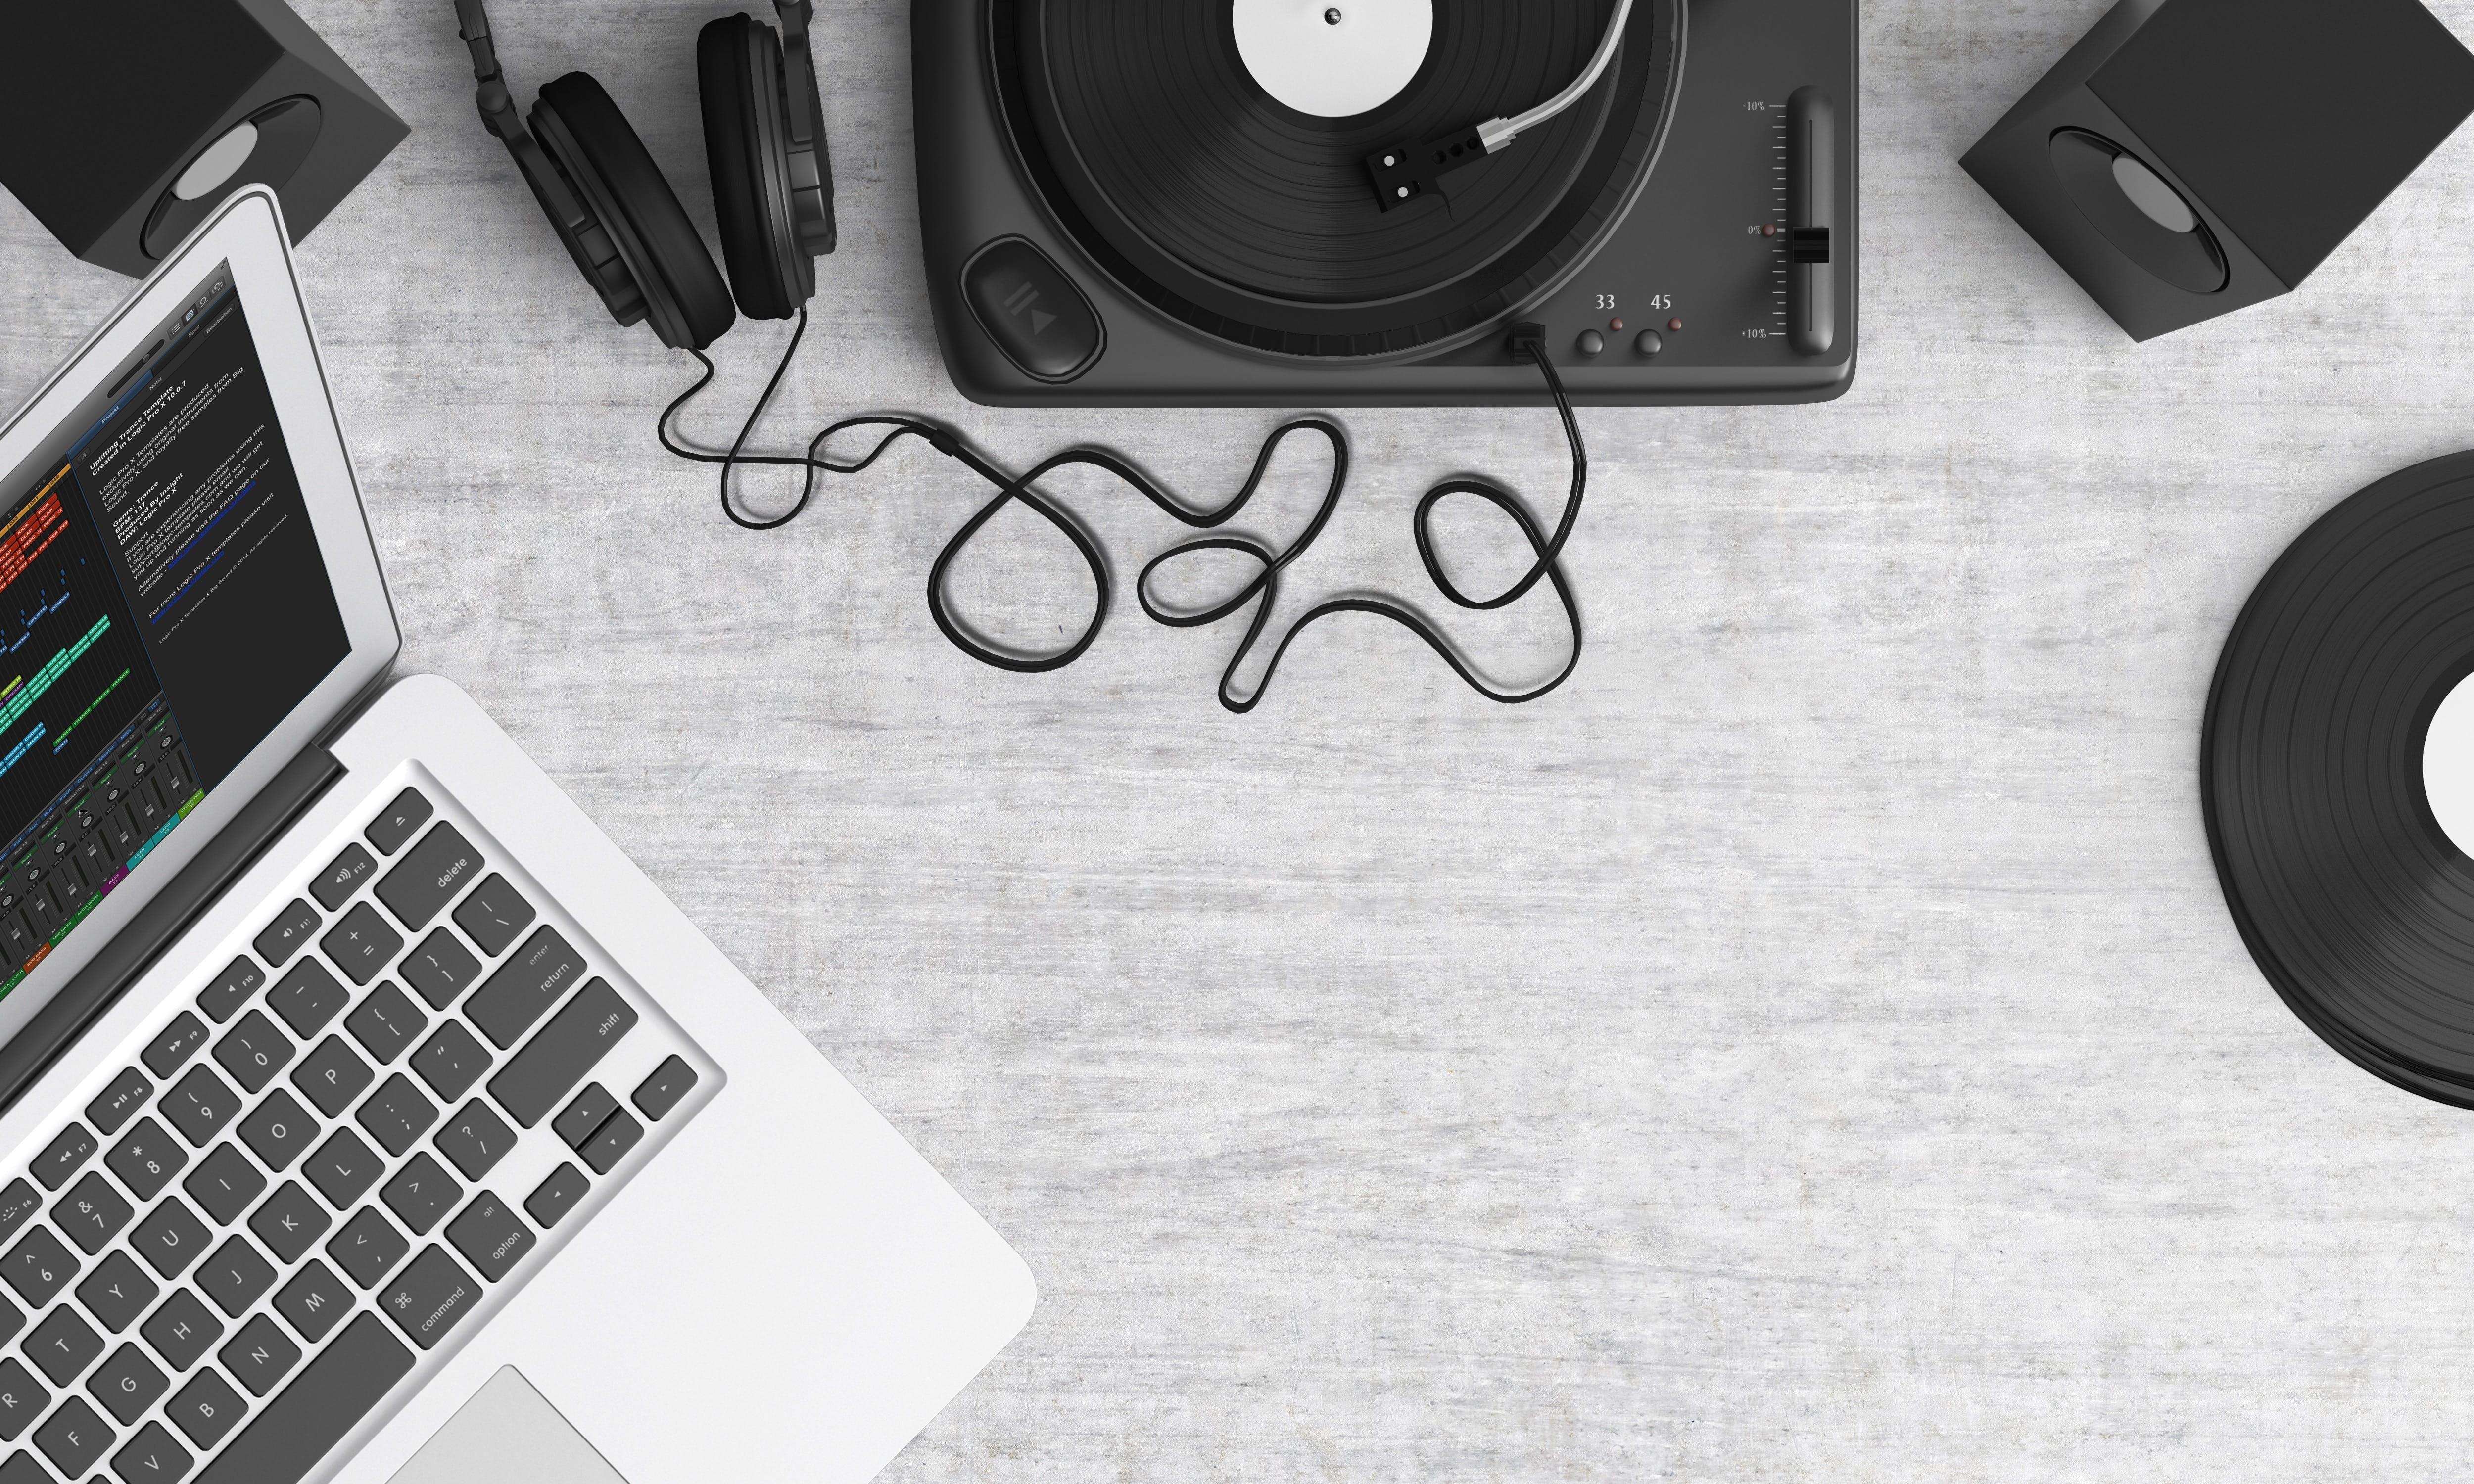 Macbook Pro Beside Black Headphones on Gray Table